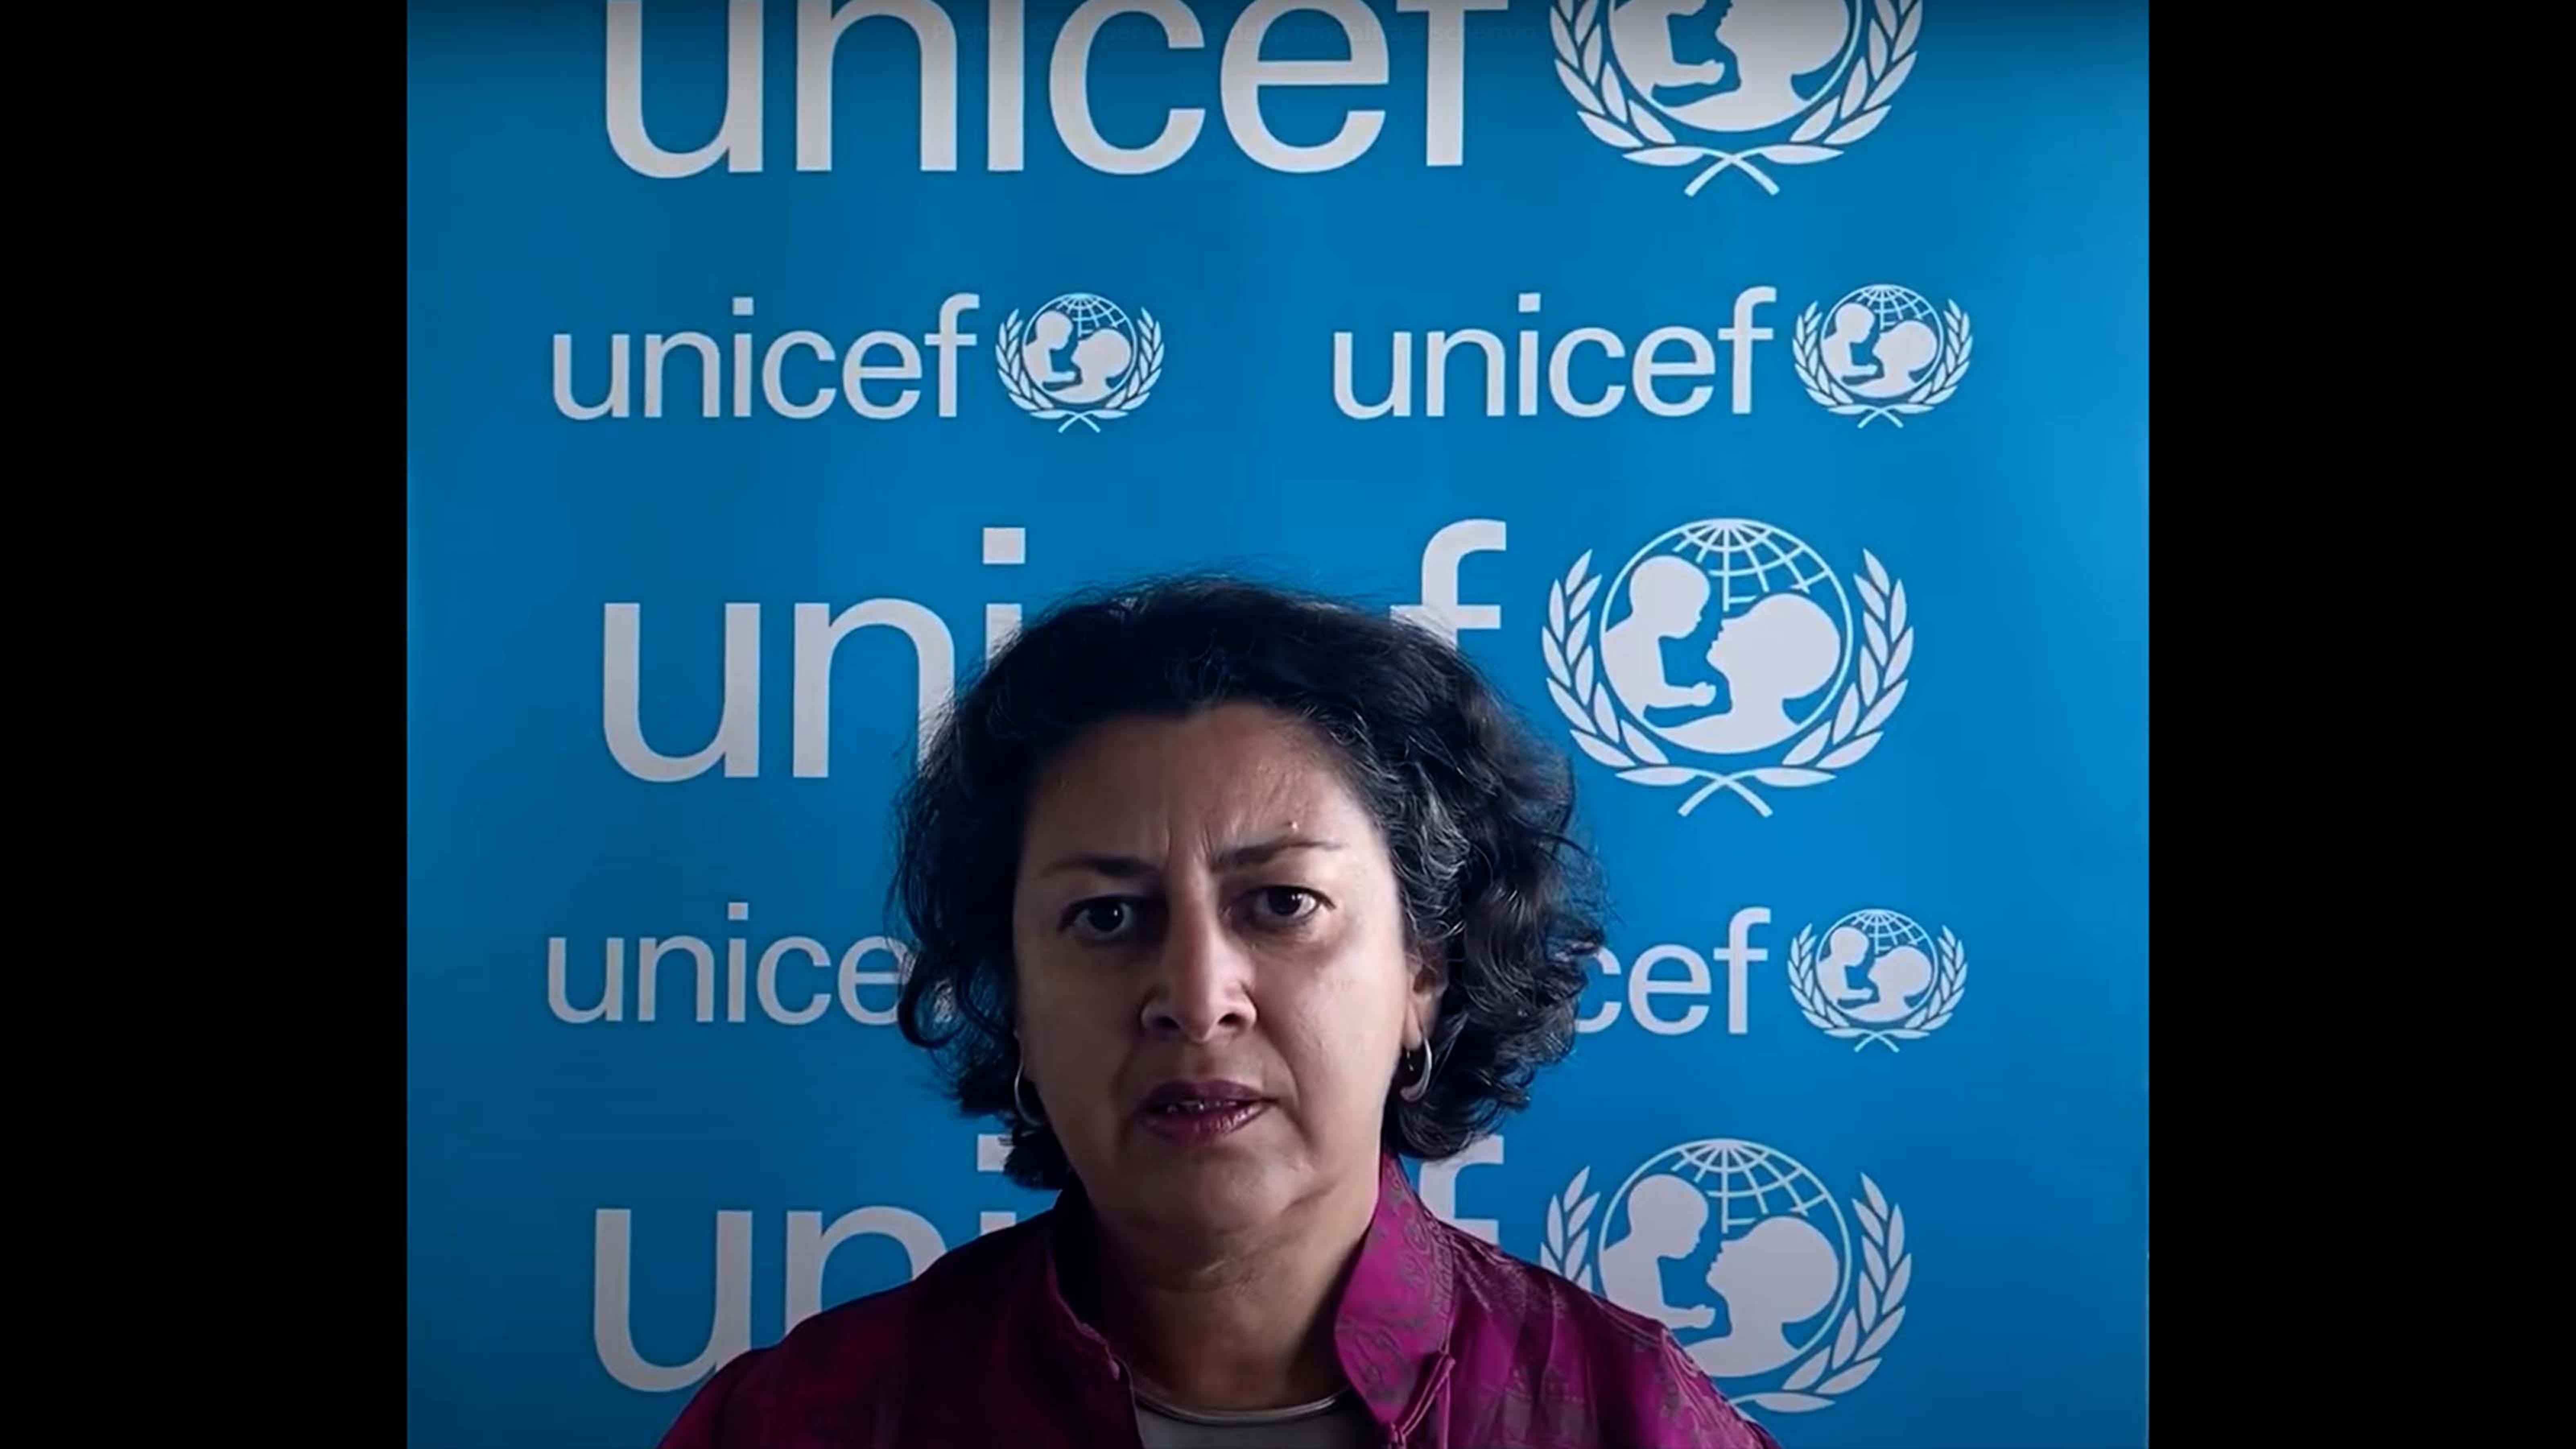 Afshan Khan, Direttrice Regionale UNICEF per l'Europa e  l'Asia Gentrale, Special Coordinator per il programma